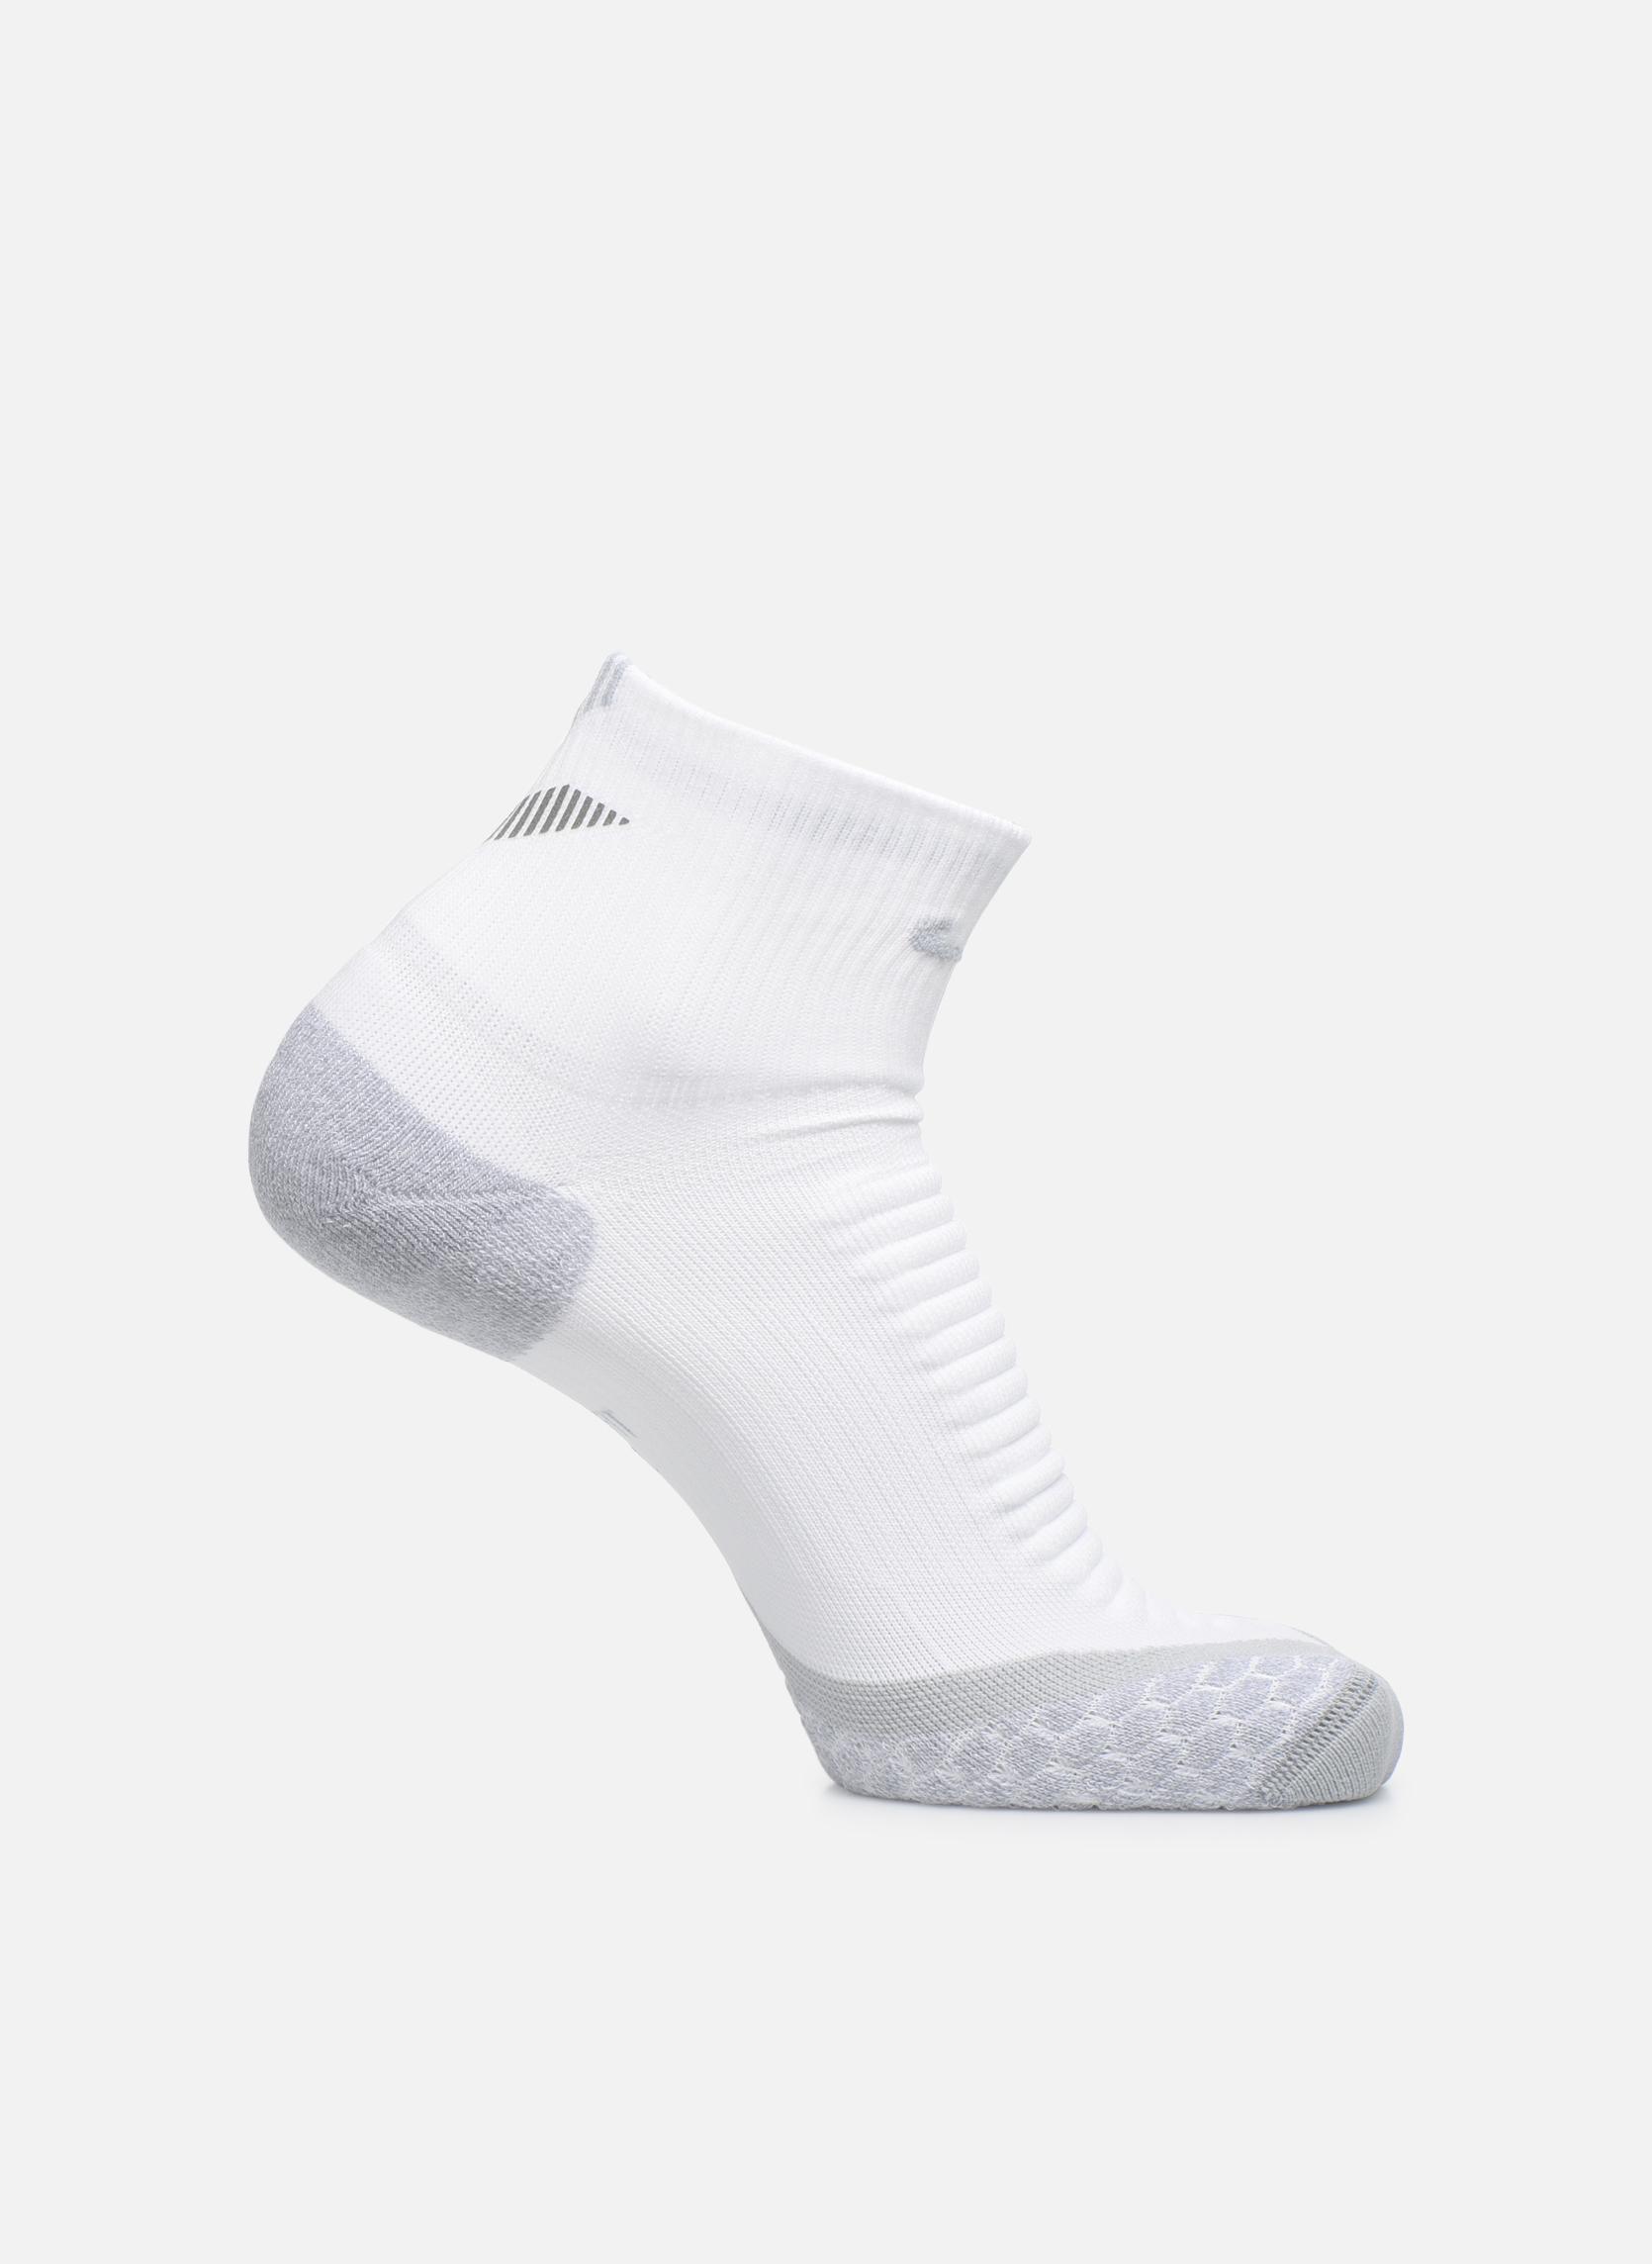 Nike Elite Cushion Quarter Running Sock WHITEWOLF GREY(WOLF GREY)